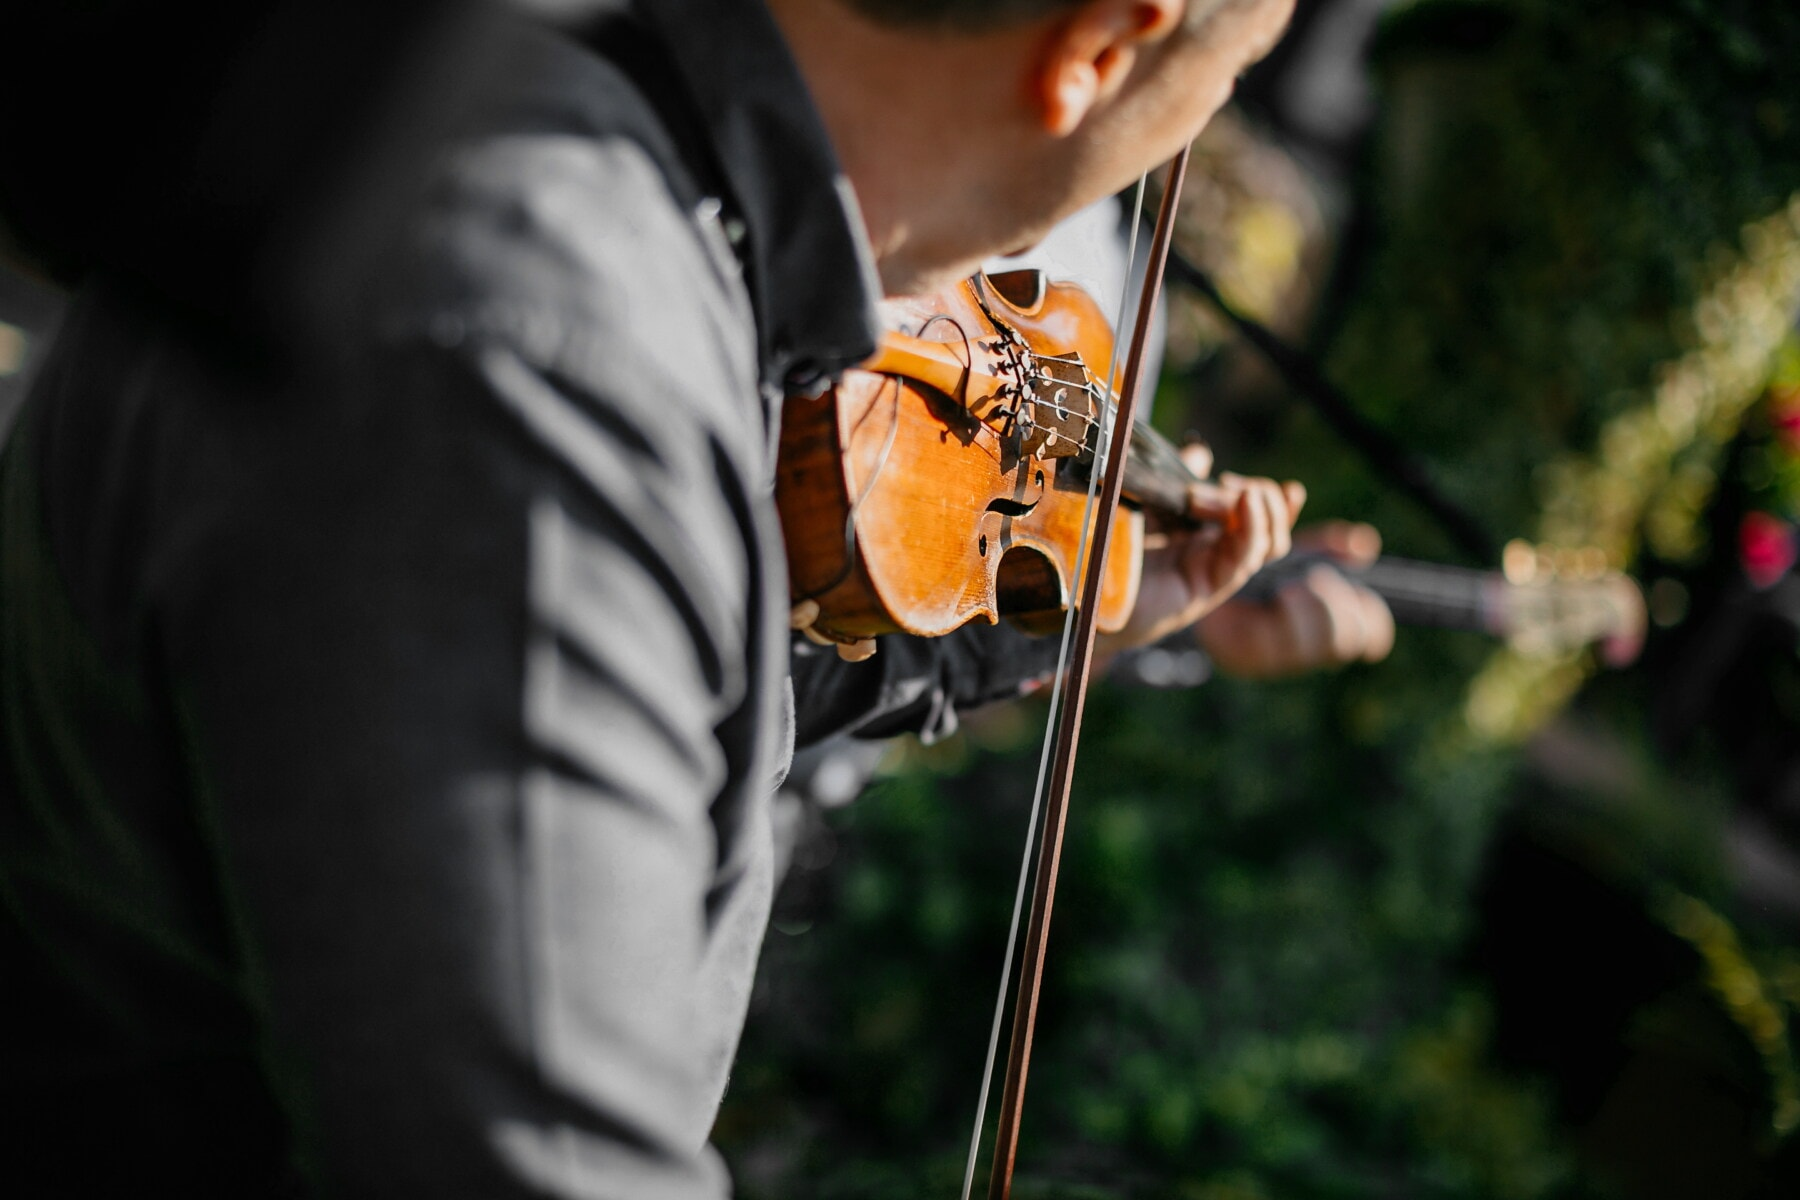 violin, musician, music, street, man, entertainment, melody, concert, performance, festival